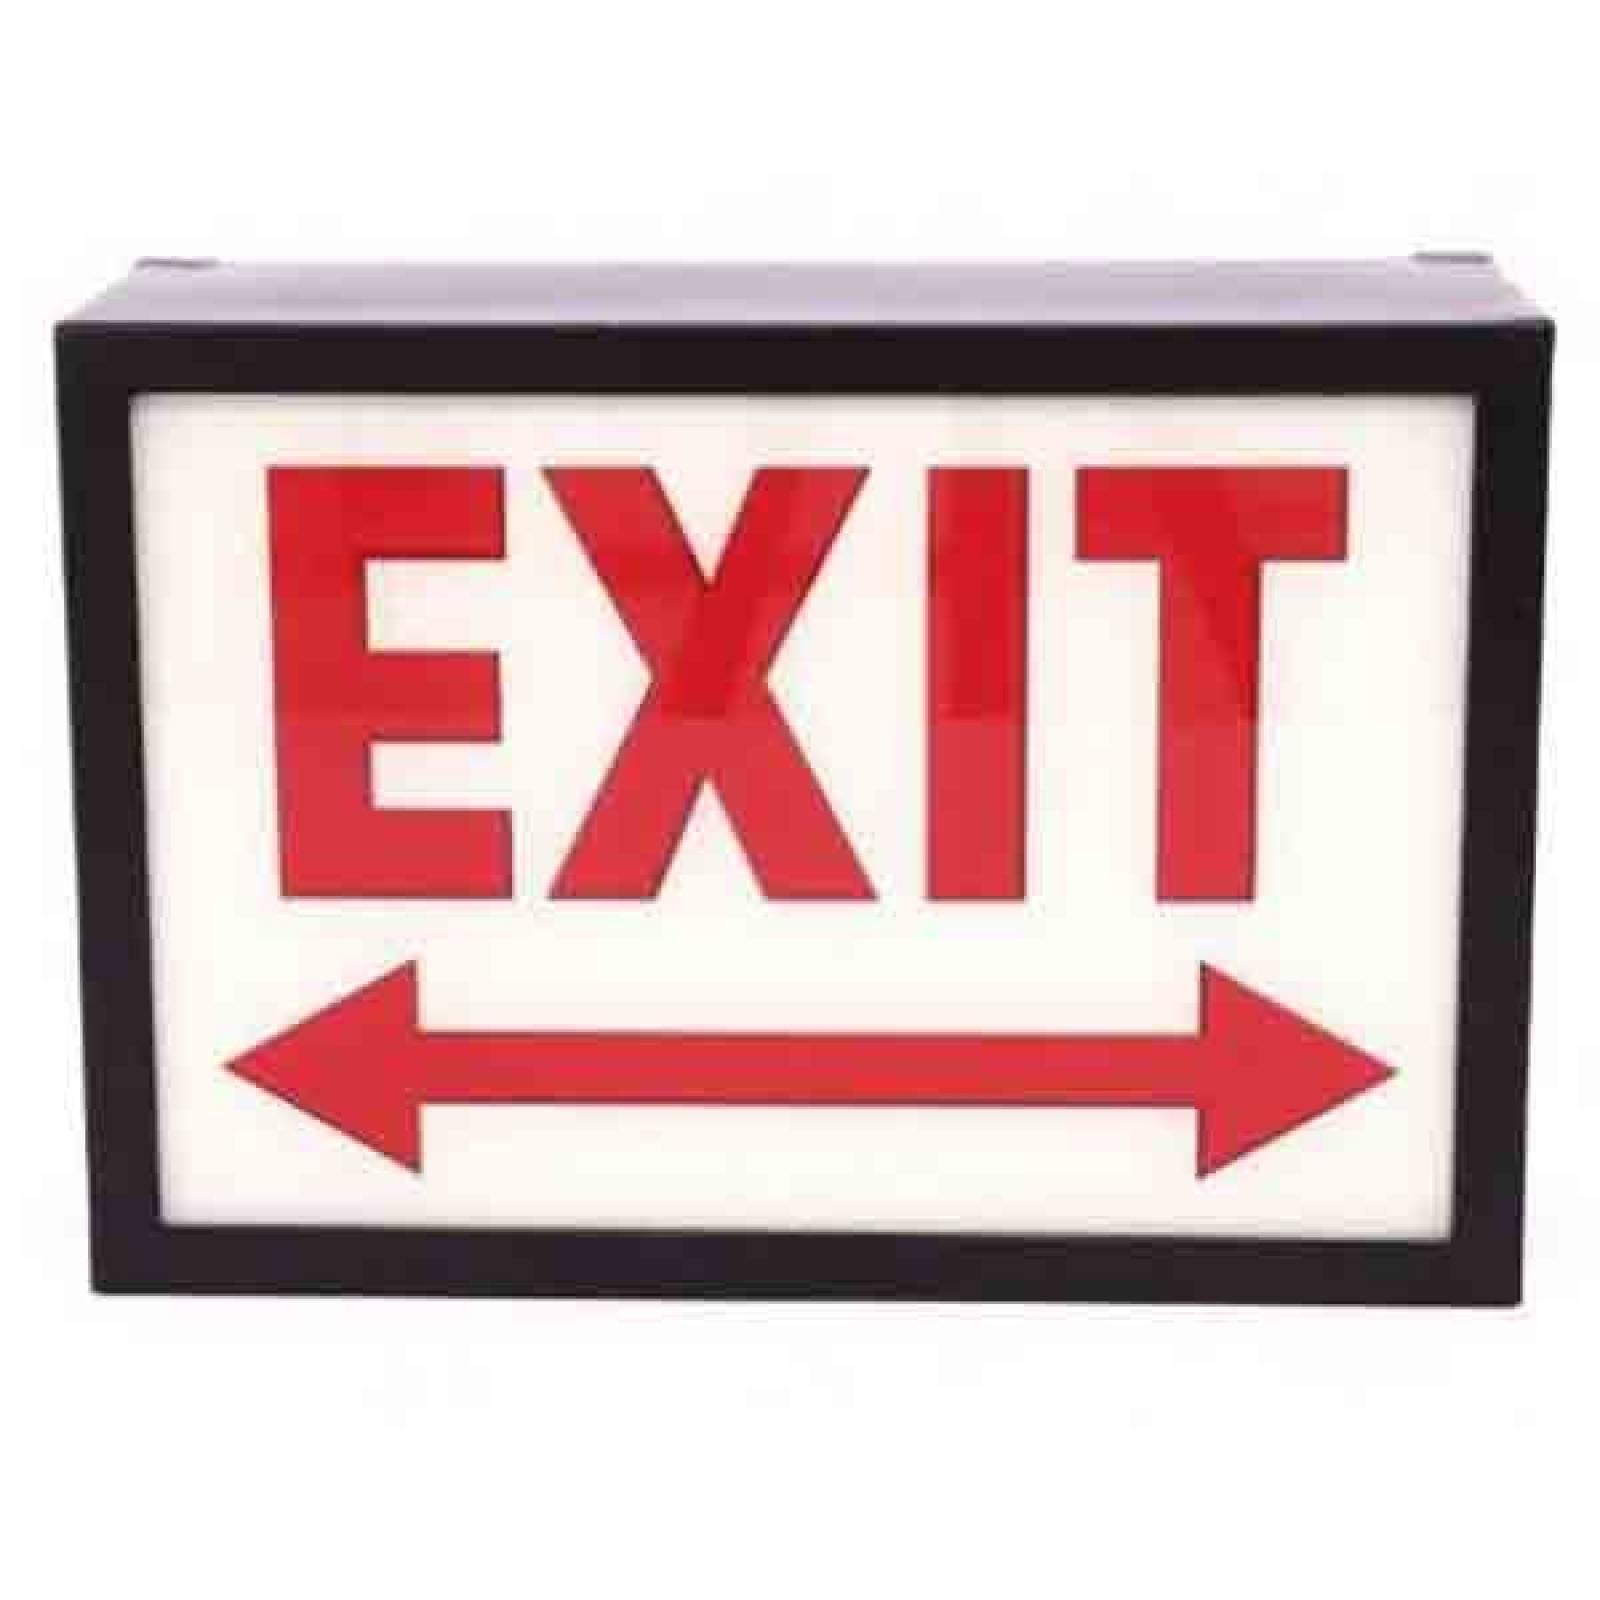 Exit Illuminated Sign Wall Mount Box Sign